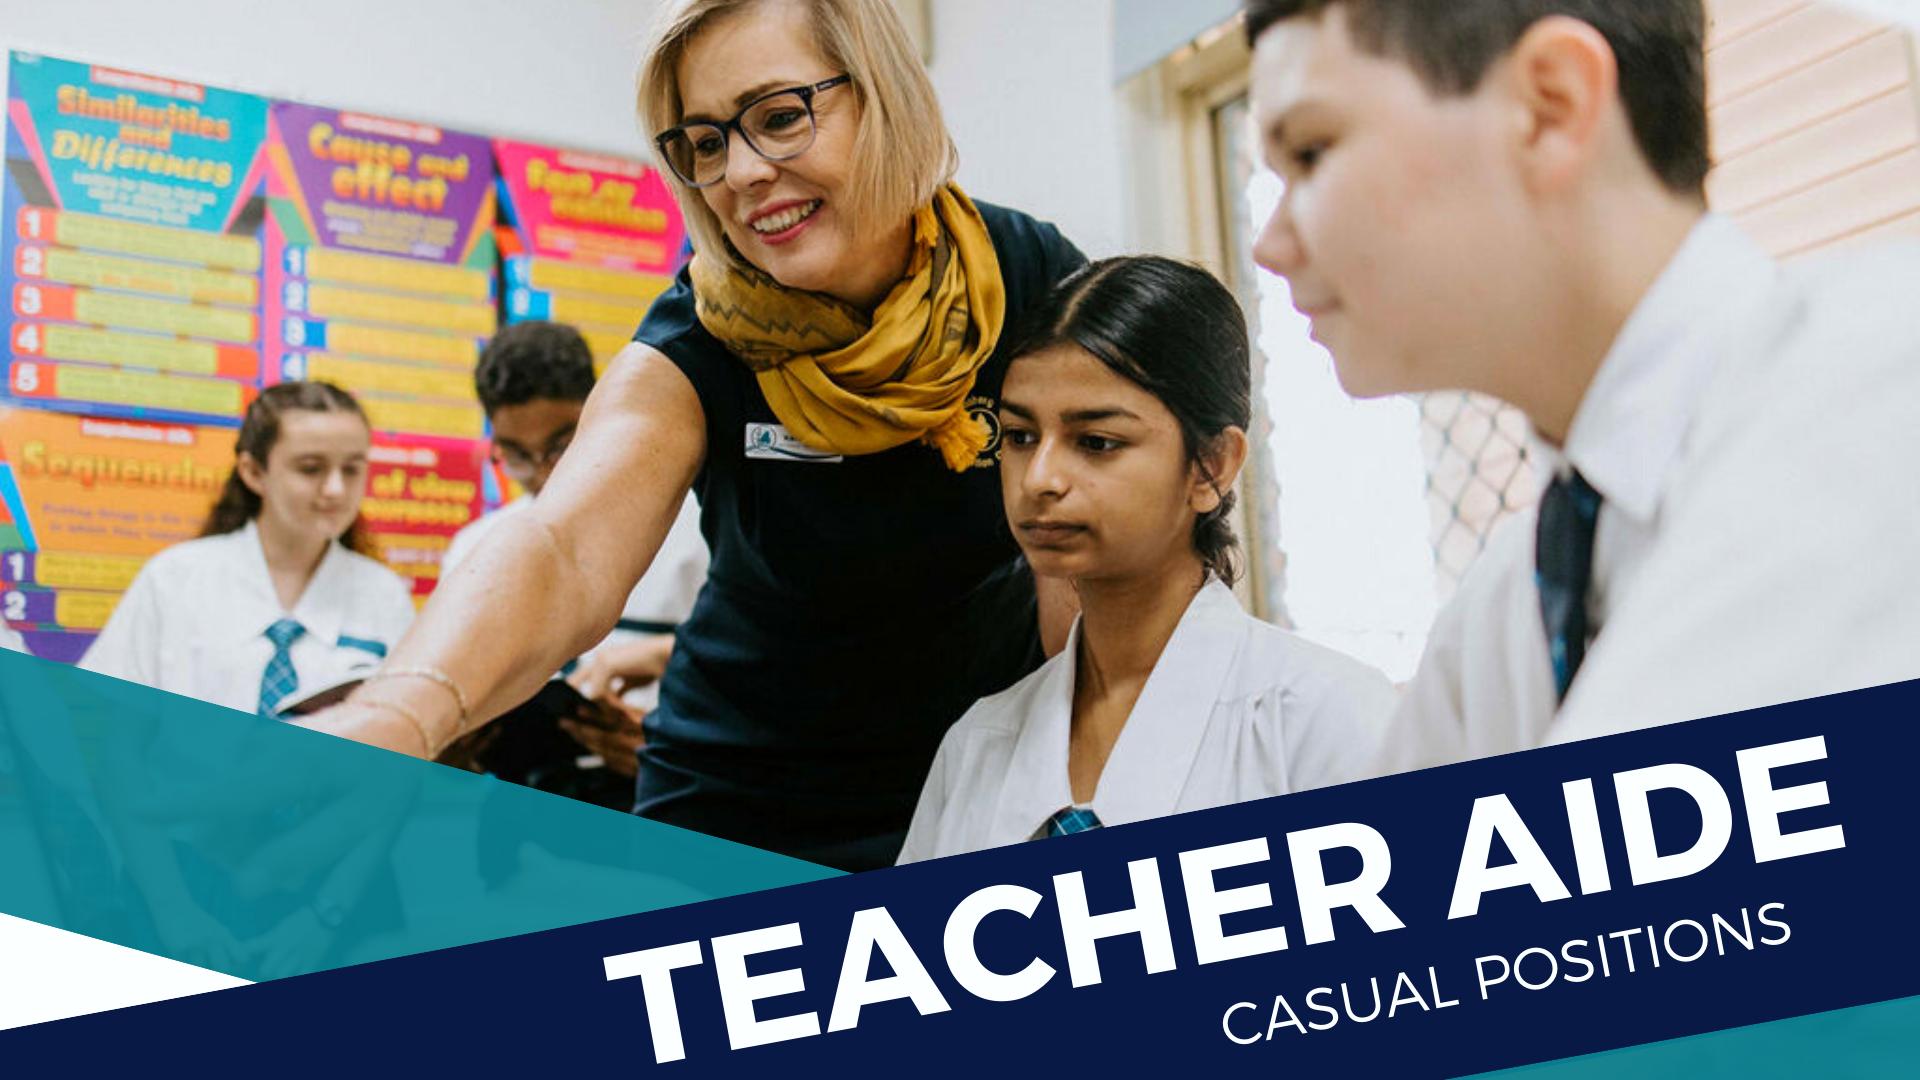 Teacher Aide Positions